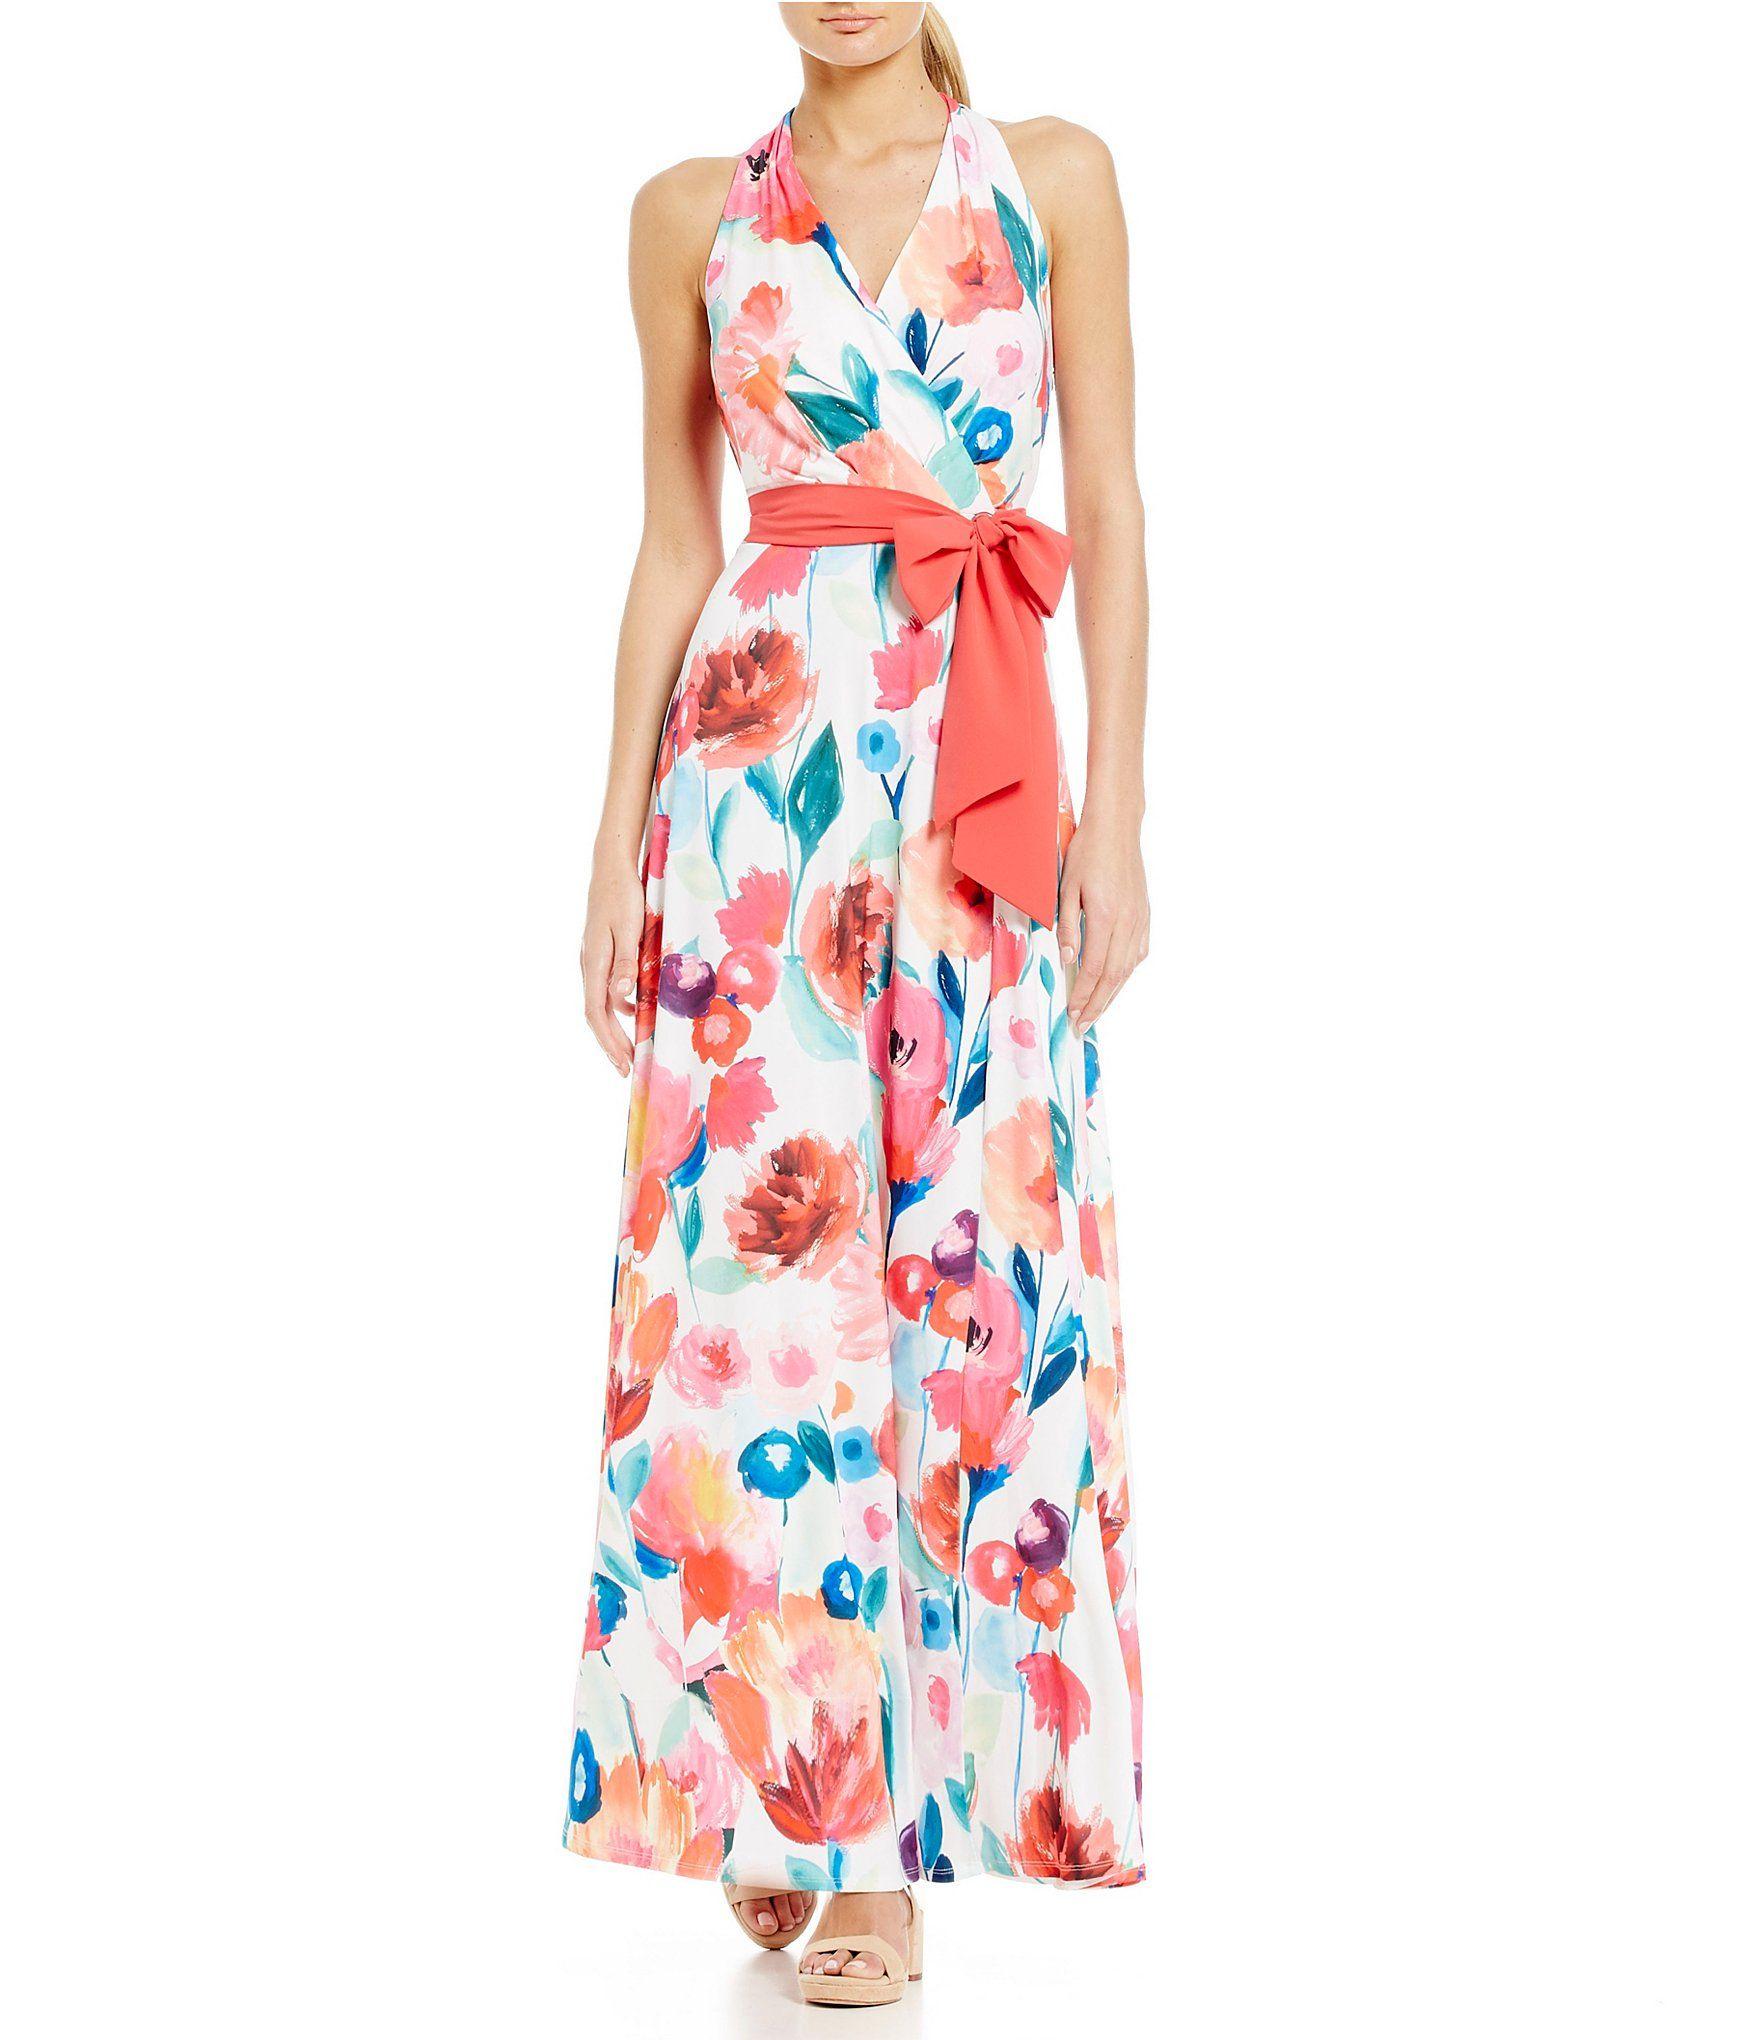 c97ddd3c8e Leslie Fay Floral Halter Maxi Dress  Dillards